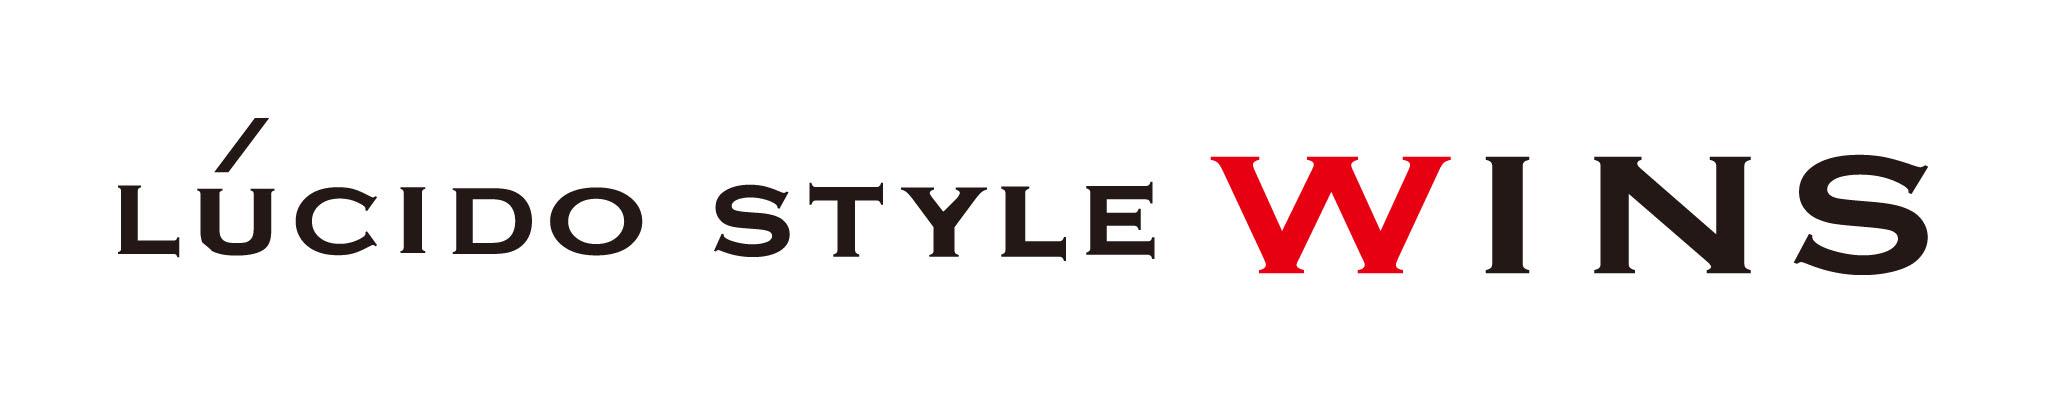 LUCIDO STYLE WINS(ルシードスタイルウインズ)・豊橋美容室